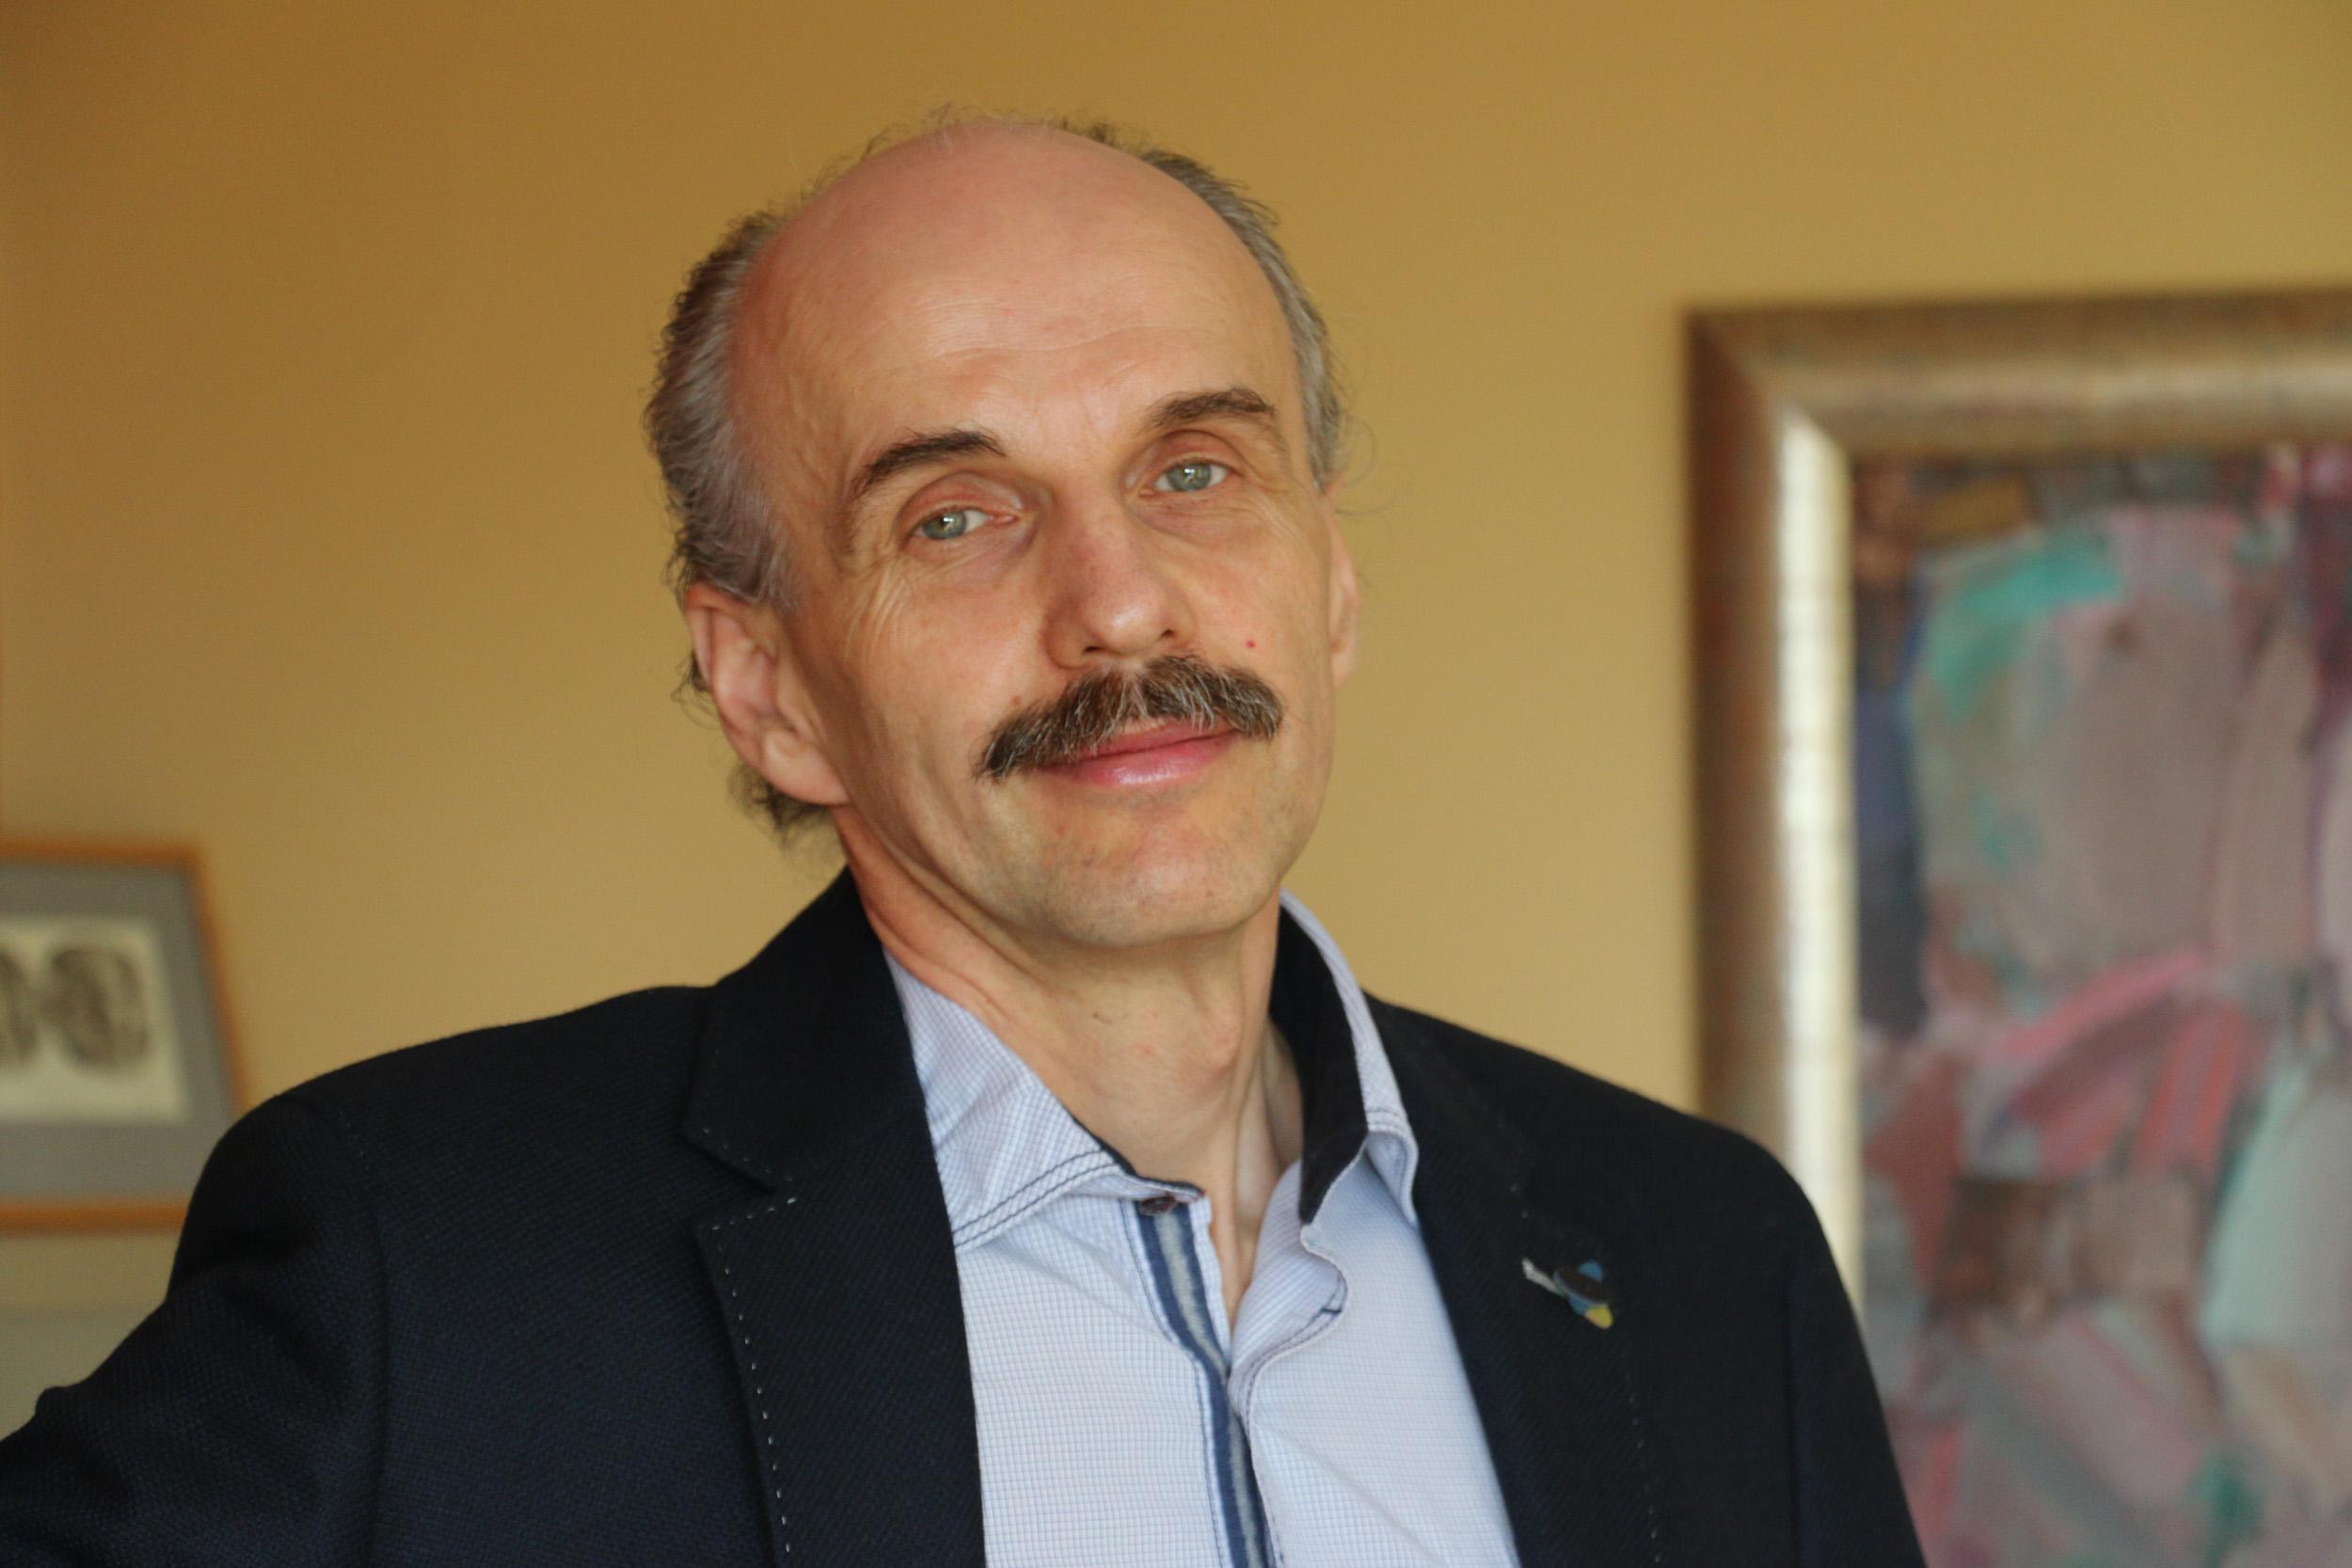 MilanKocis Interior designer FMDESIGN founder